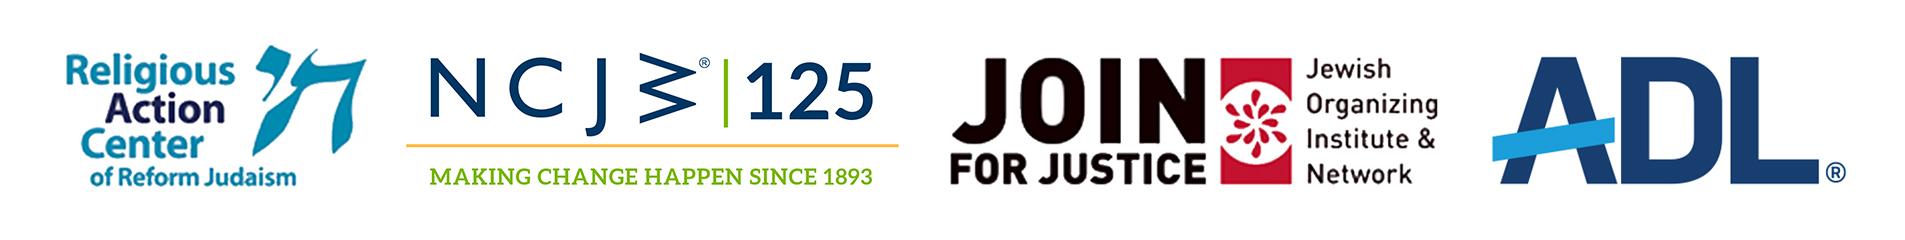 Jewish_coalition_logos_3.0